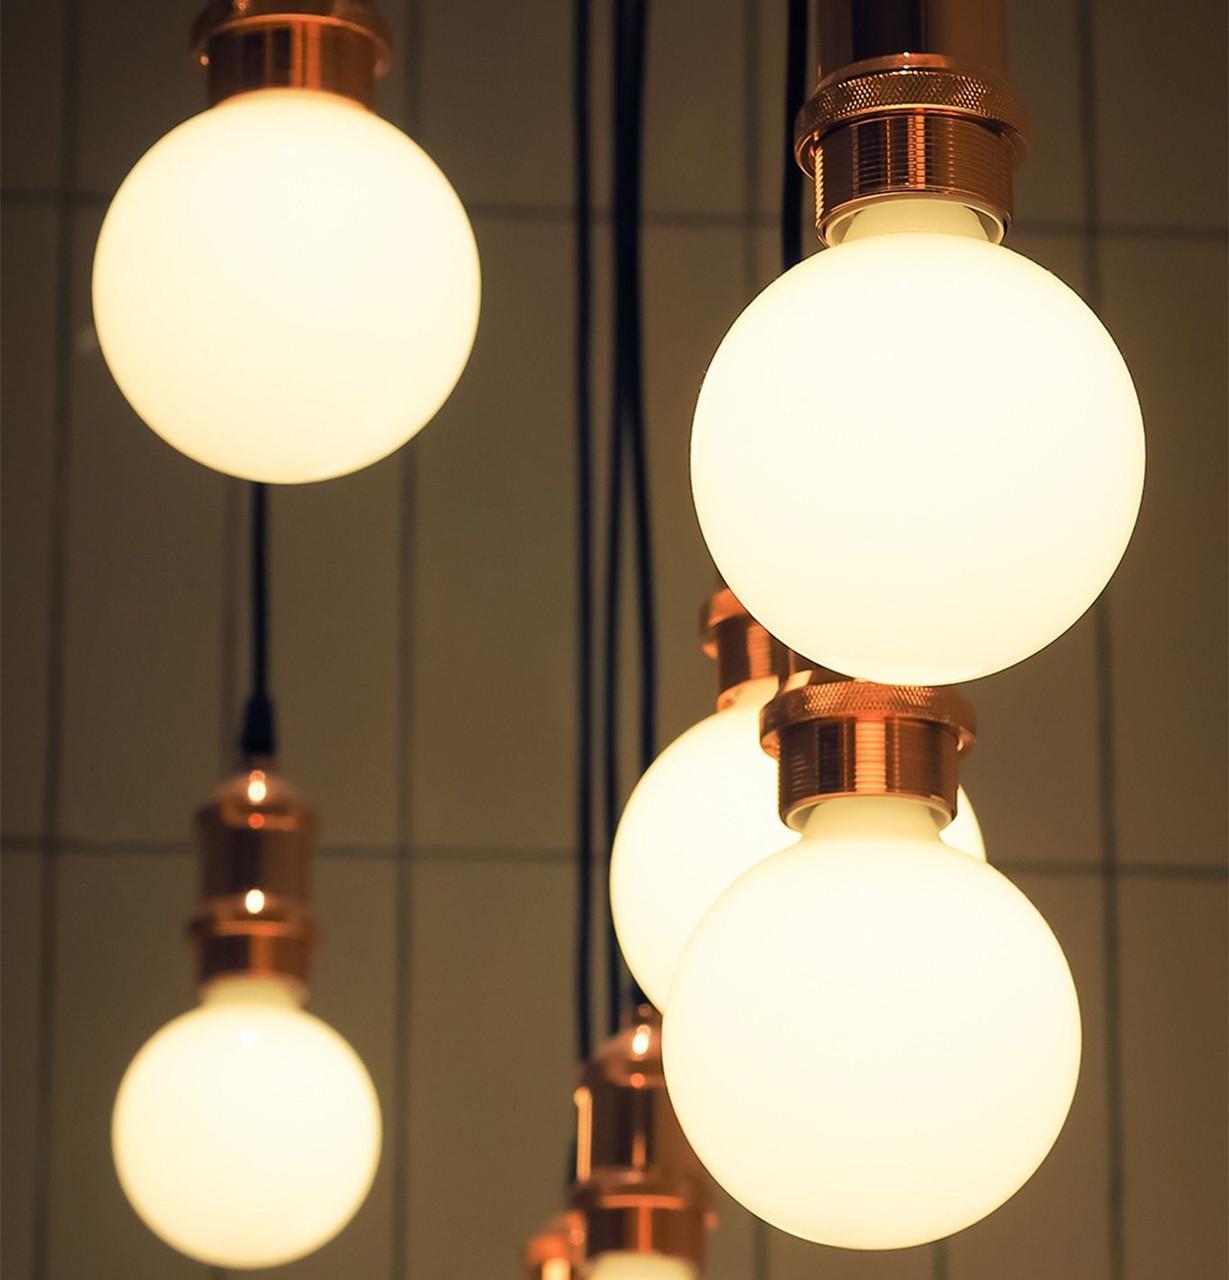 LED G80 ES-E27 Light Bulbs